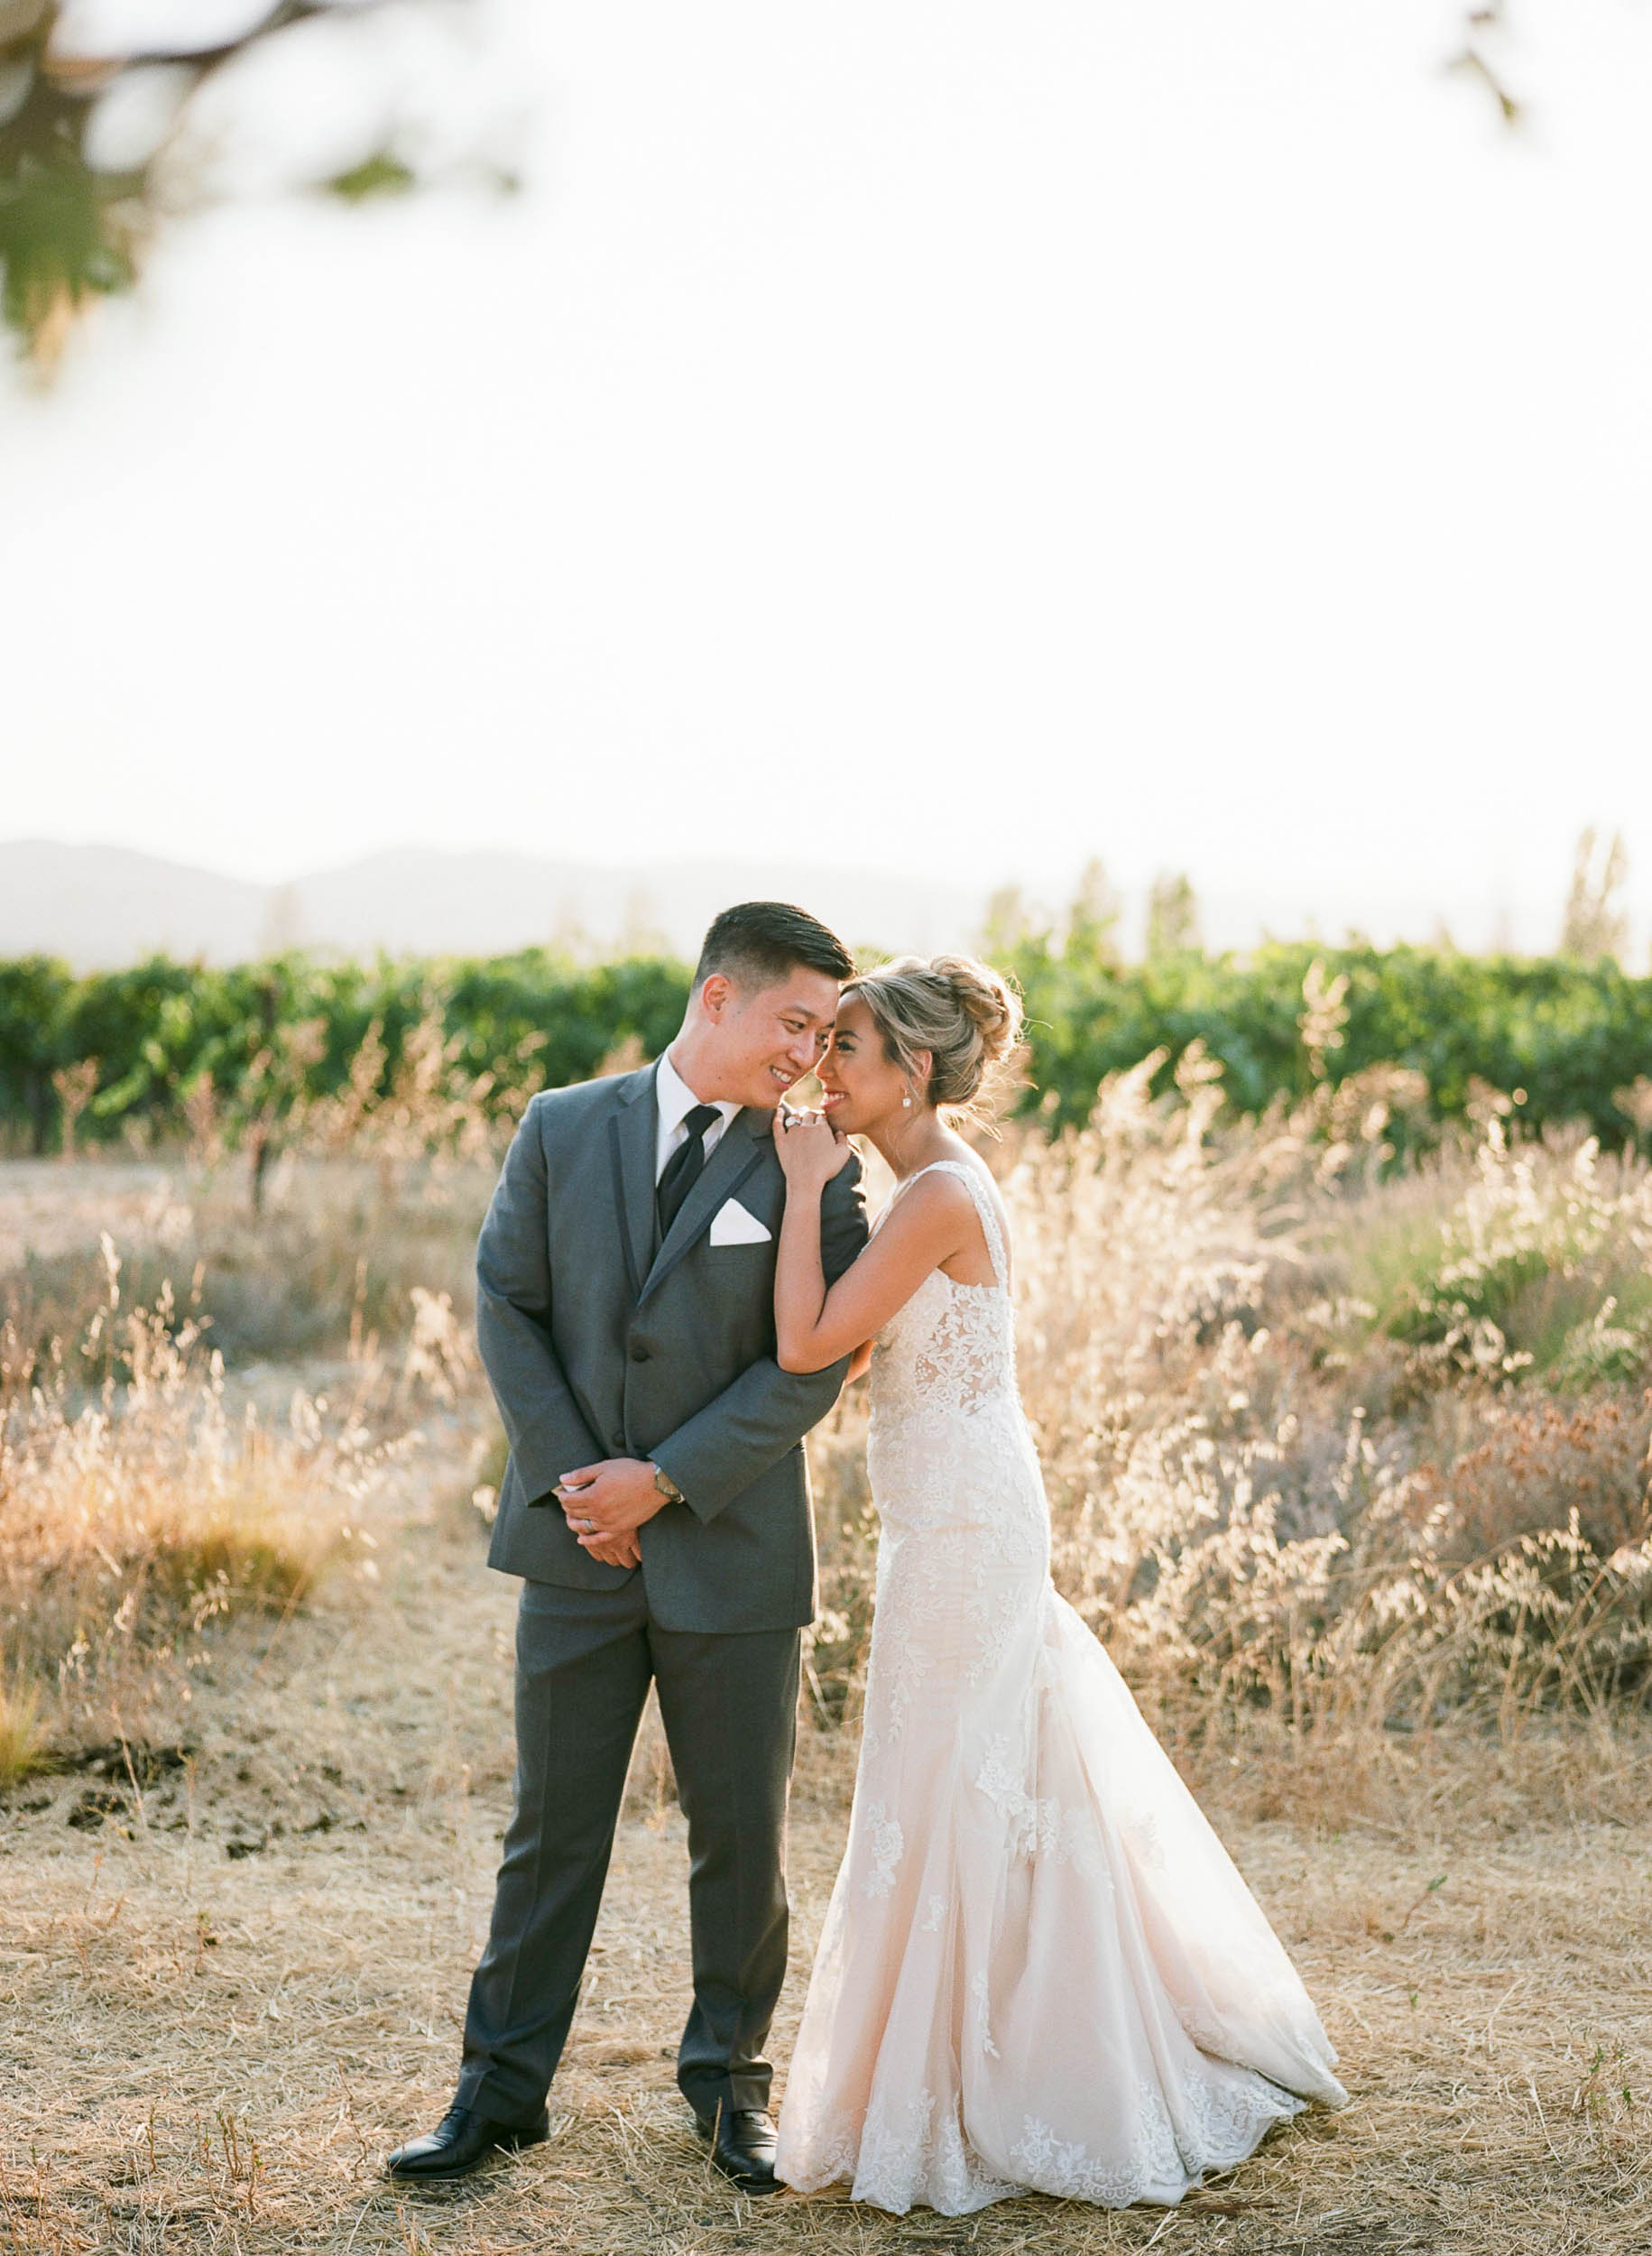 Las Positas Wedding_Buena Lane Photography_000092030016.jpg